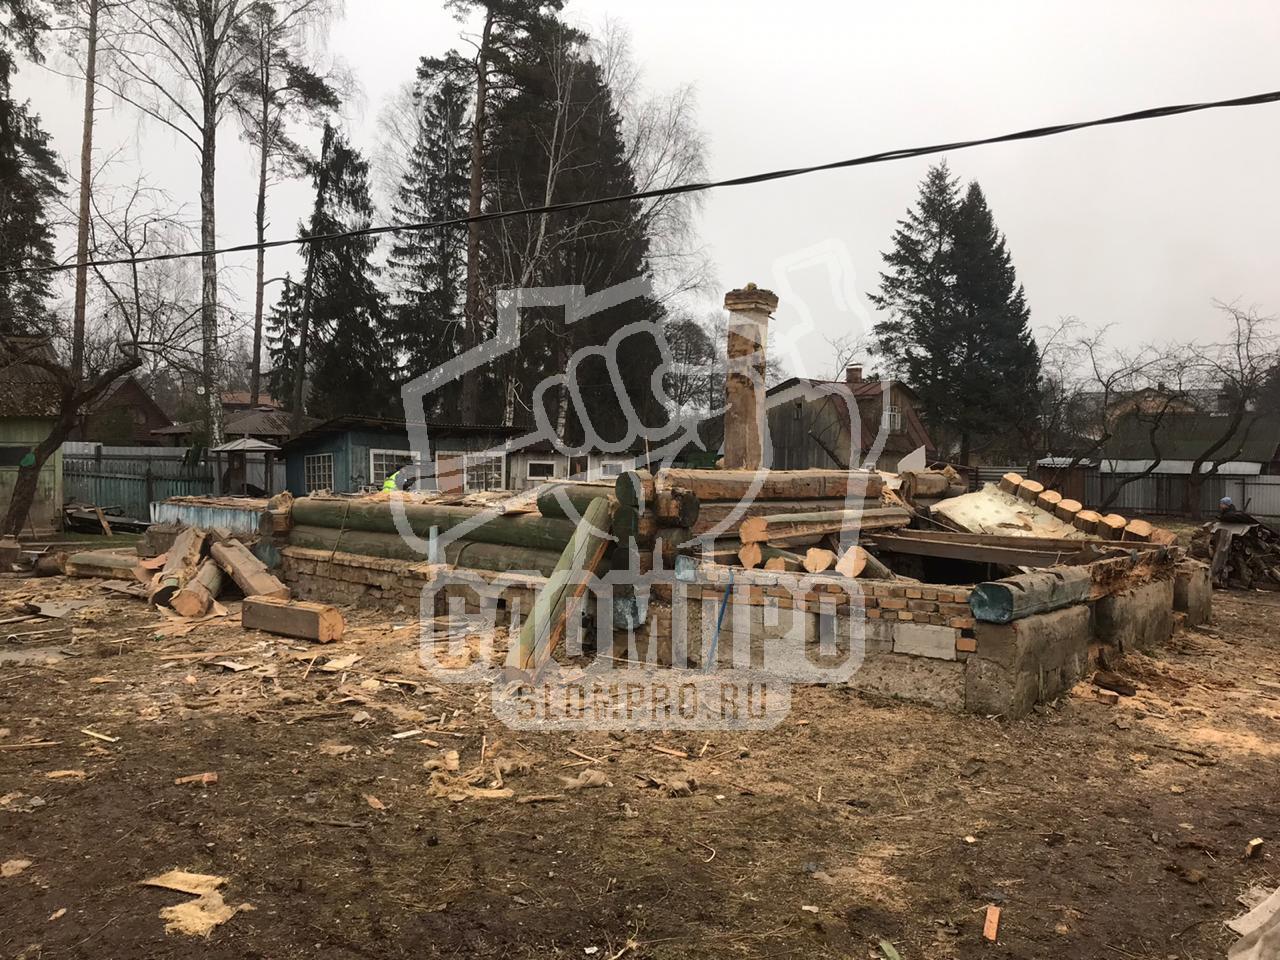 Процесс демонтажа бревенчатого дома